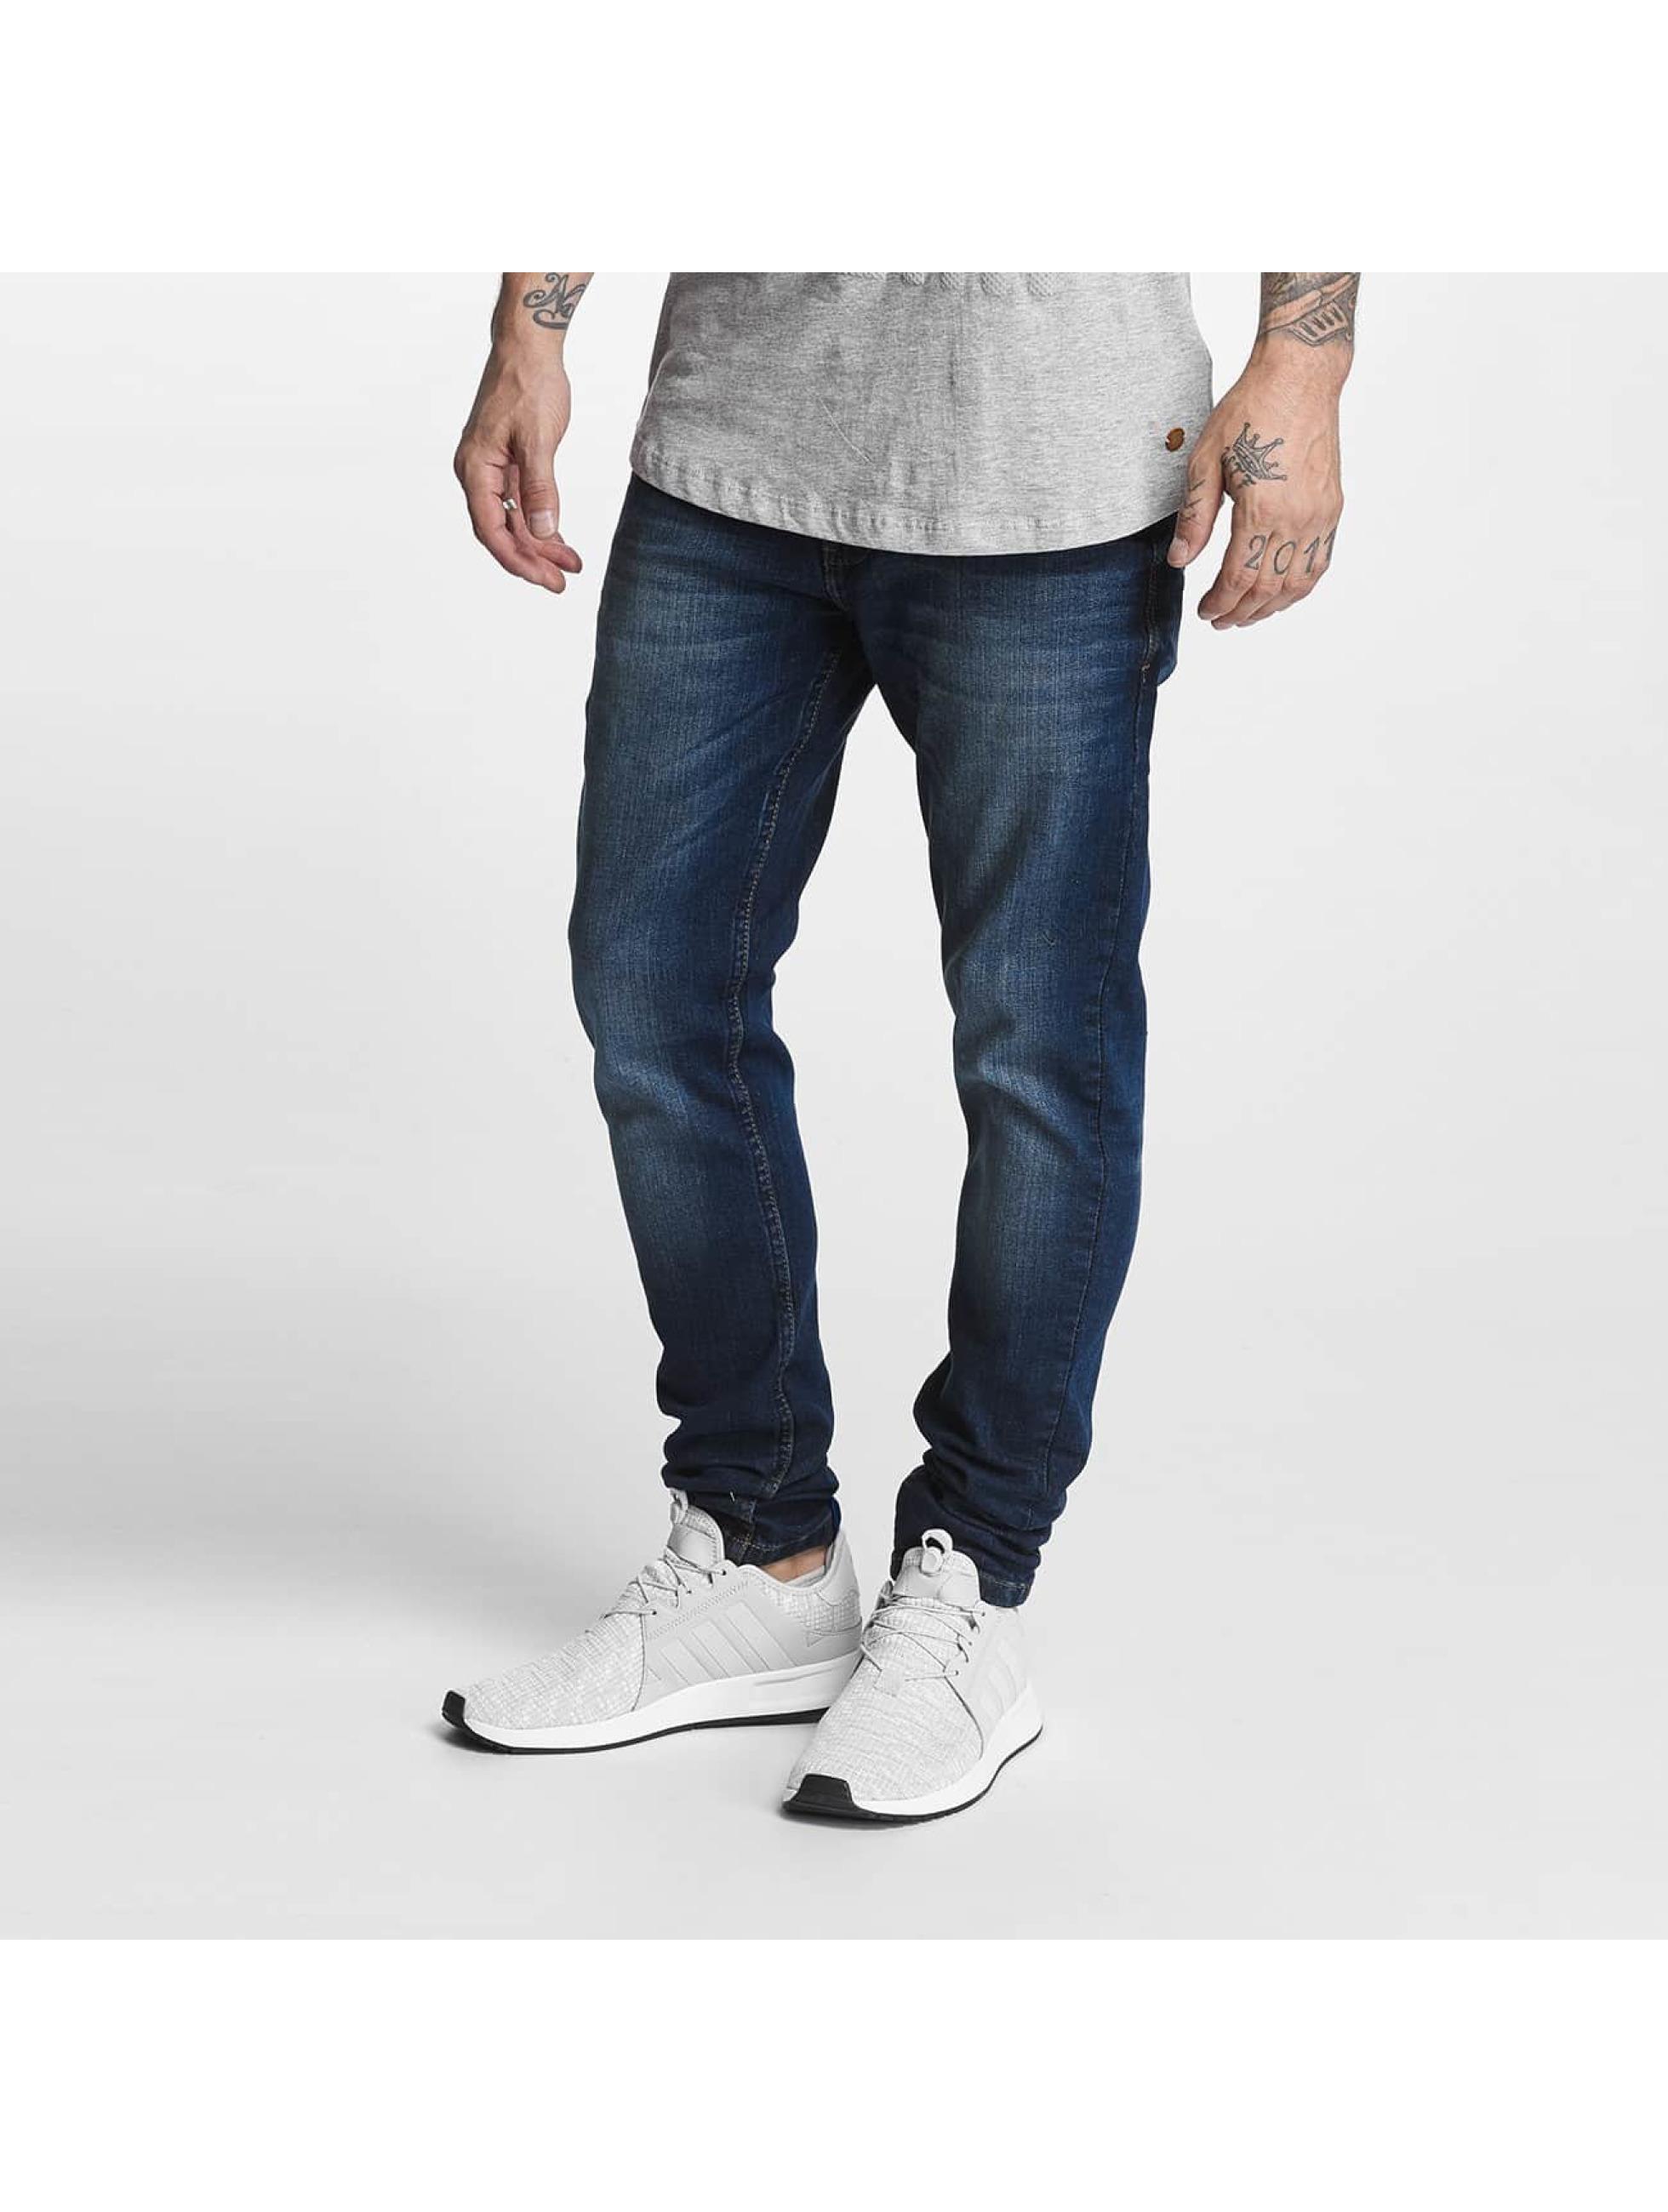 Reuthen Angebote Rocawear Männer Straight Fit Jeans Pune in blau